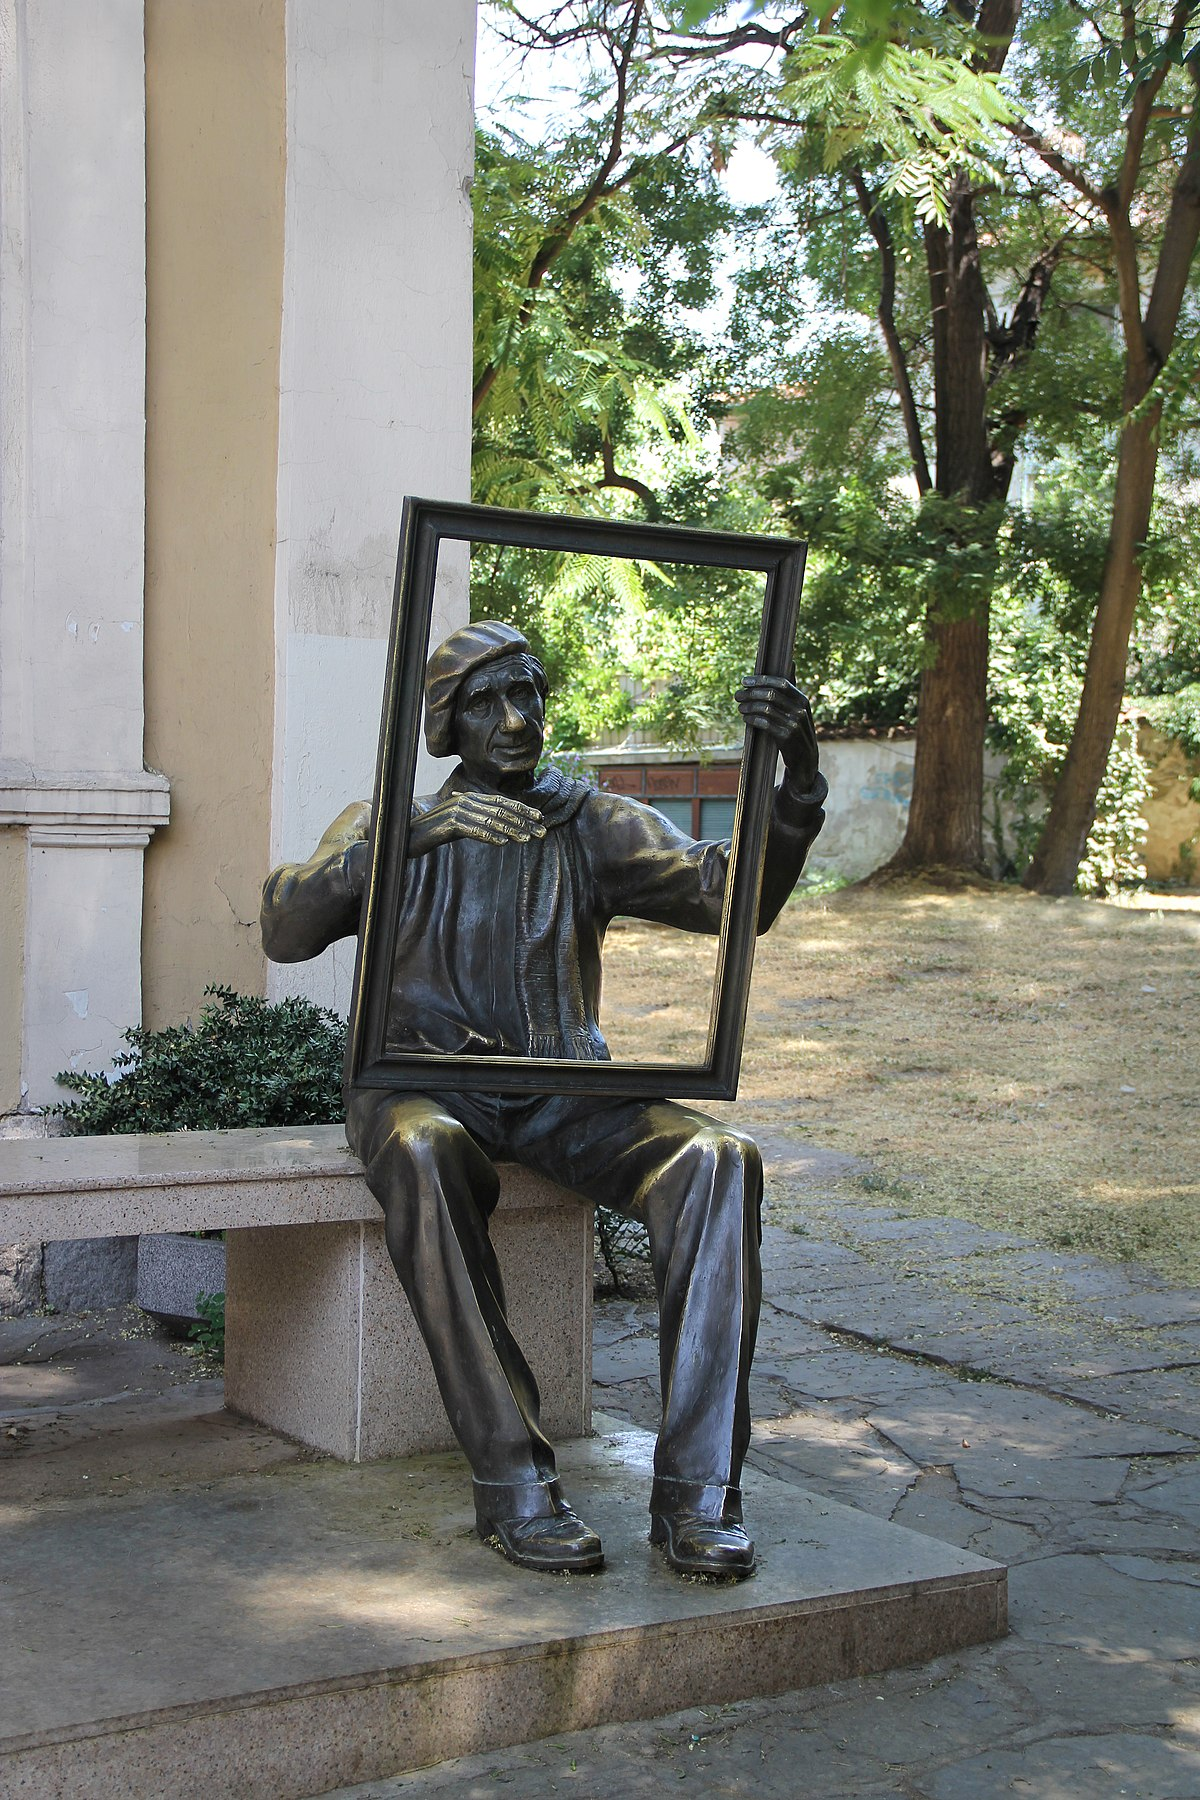 Renov & Co Les Herbiers file:statue of an artist tzanko lavrenov, plovdiv